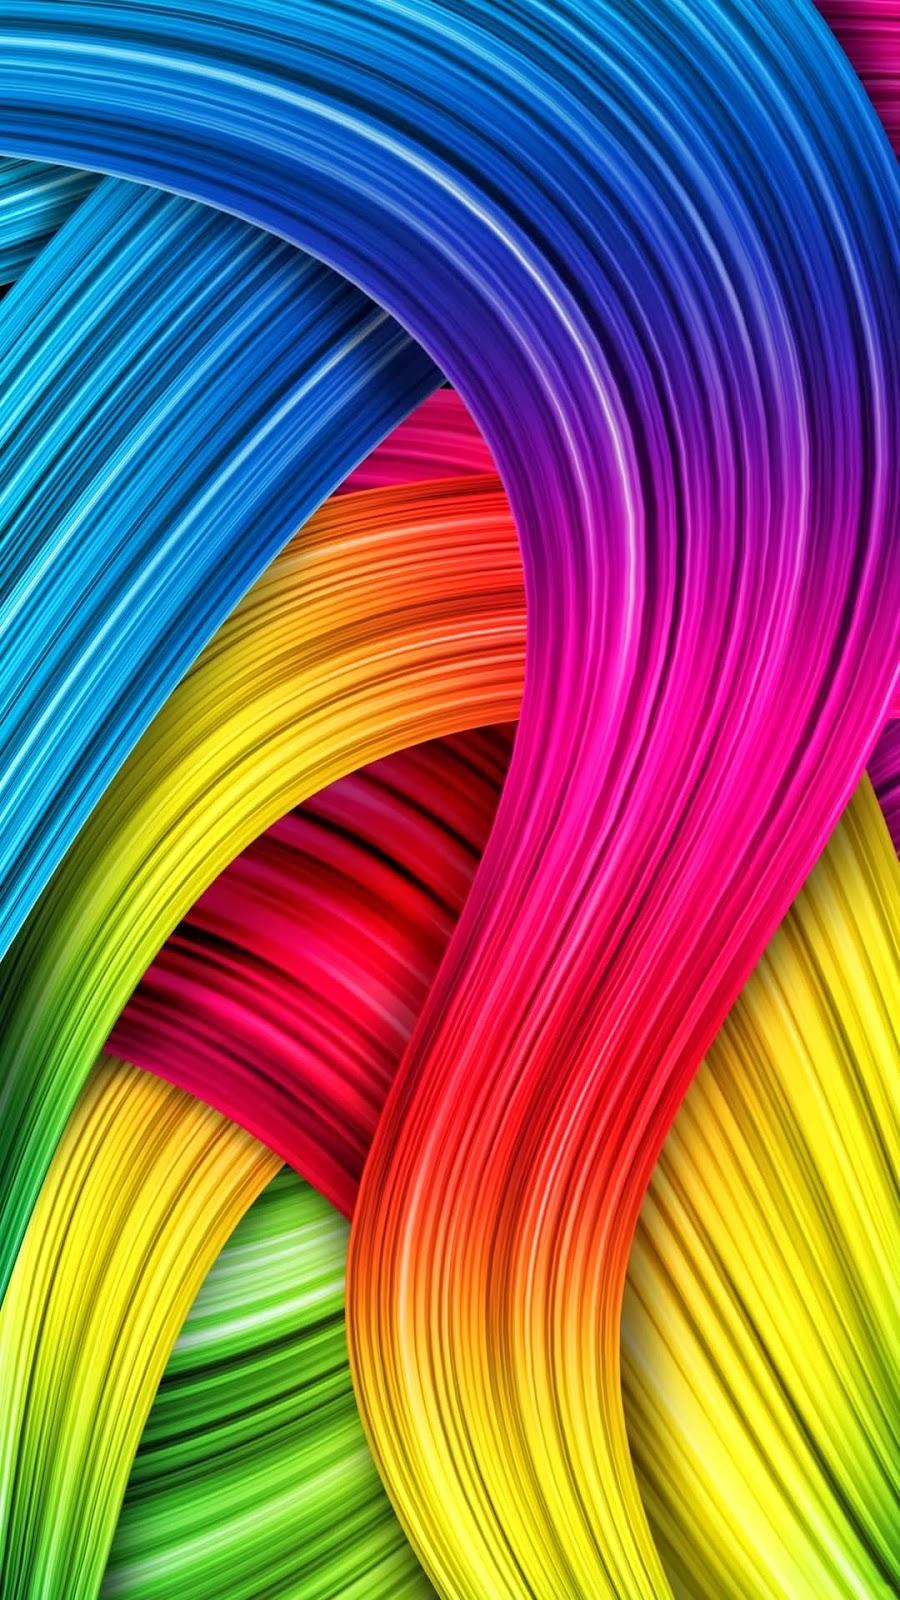 36 Wallpaper For Samsung Galaxy S3 On Wallpapersafari